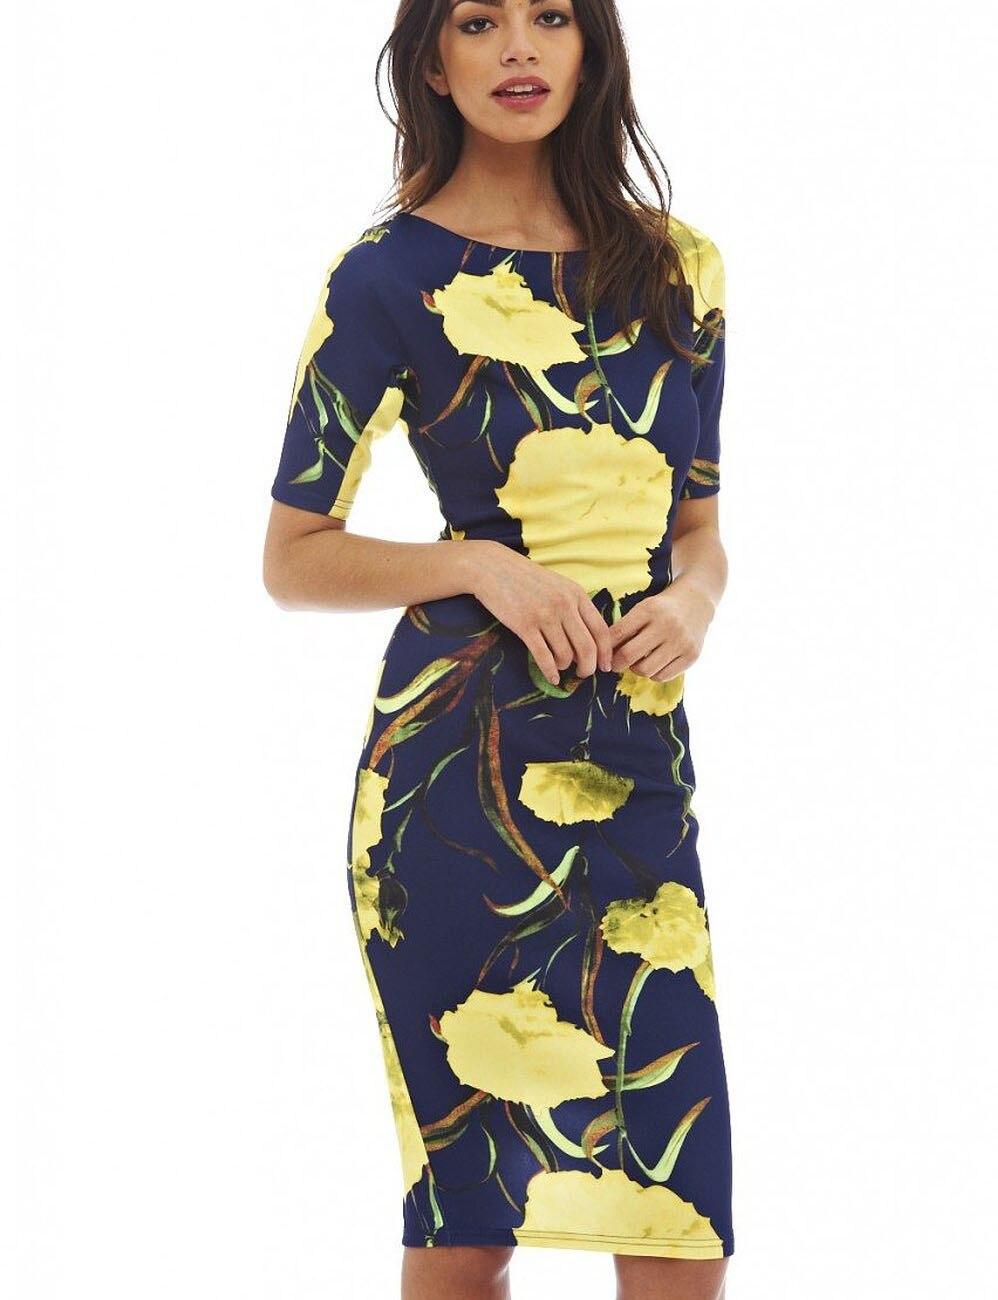 Free Shipping Women Dress Casual Summer Vestidos Sheath Plus Size 28 Styles Floral Print Dresses 106-24 short dresses office wear